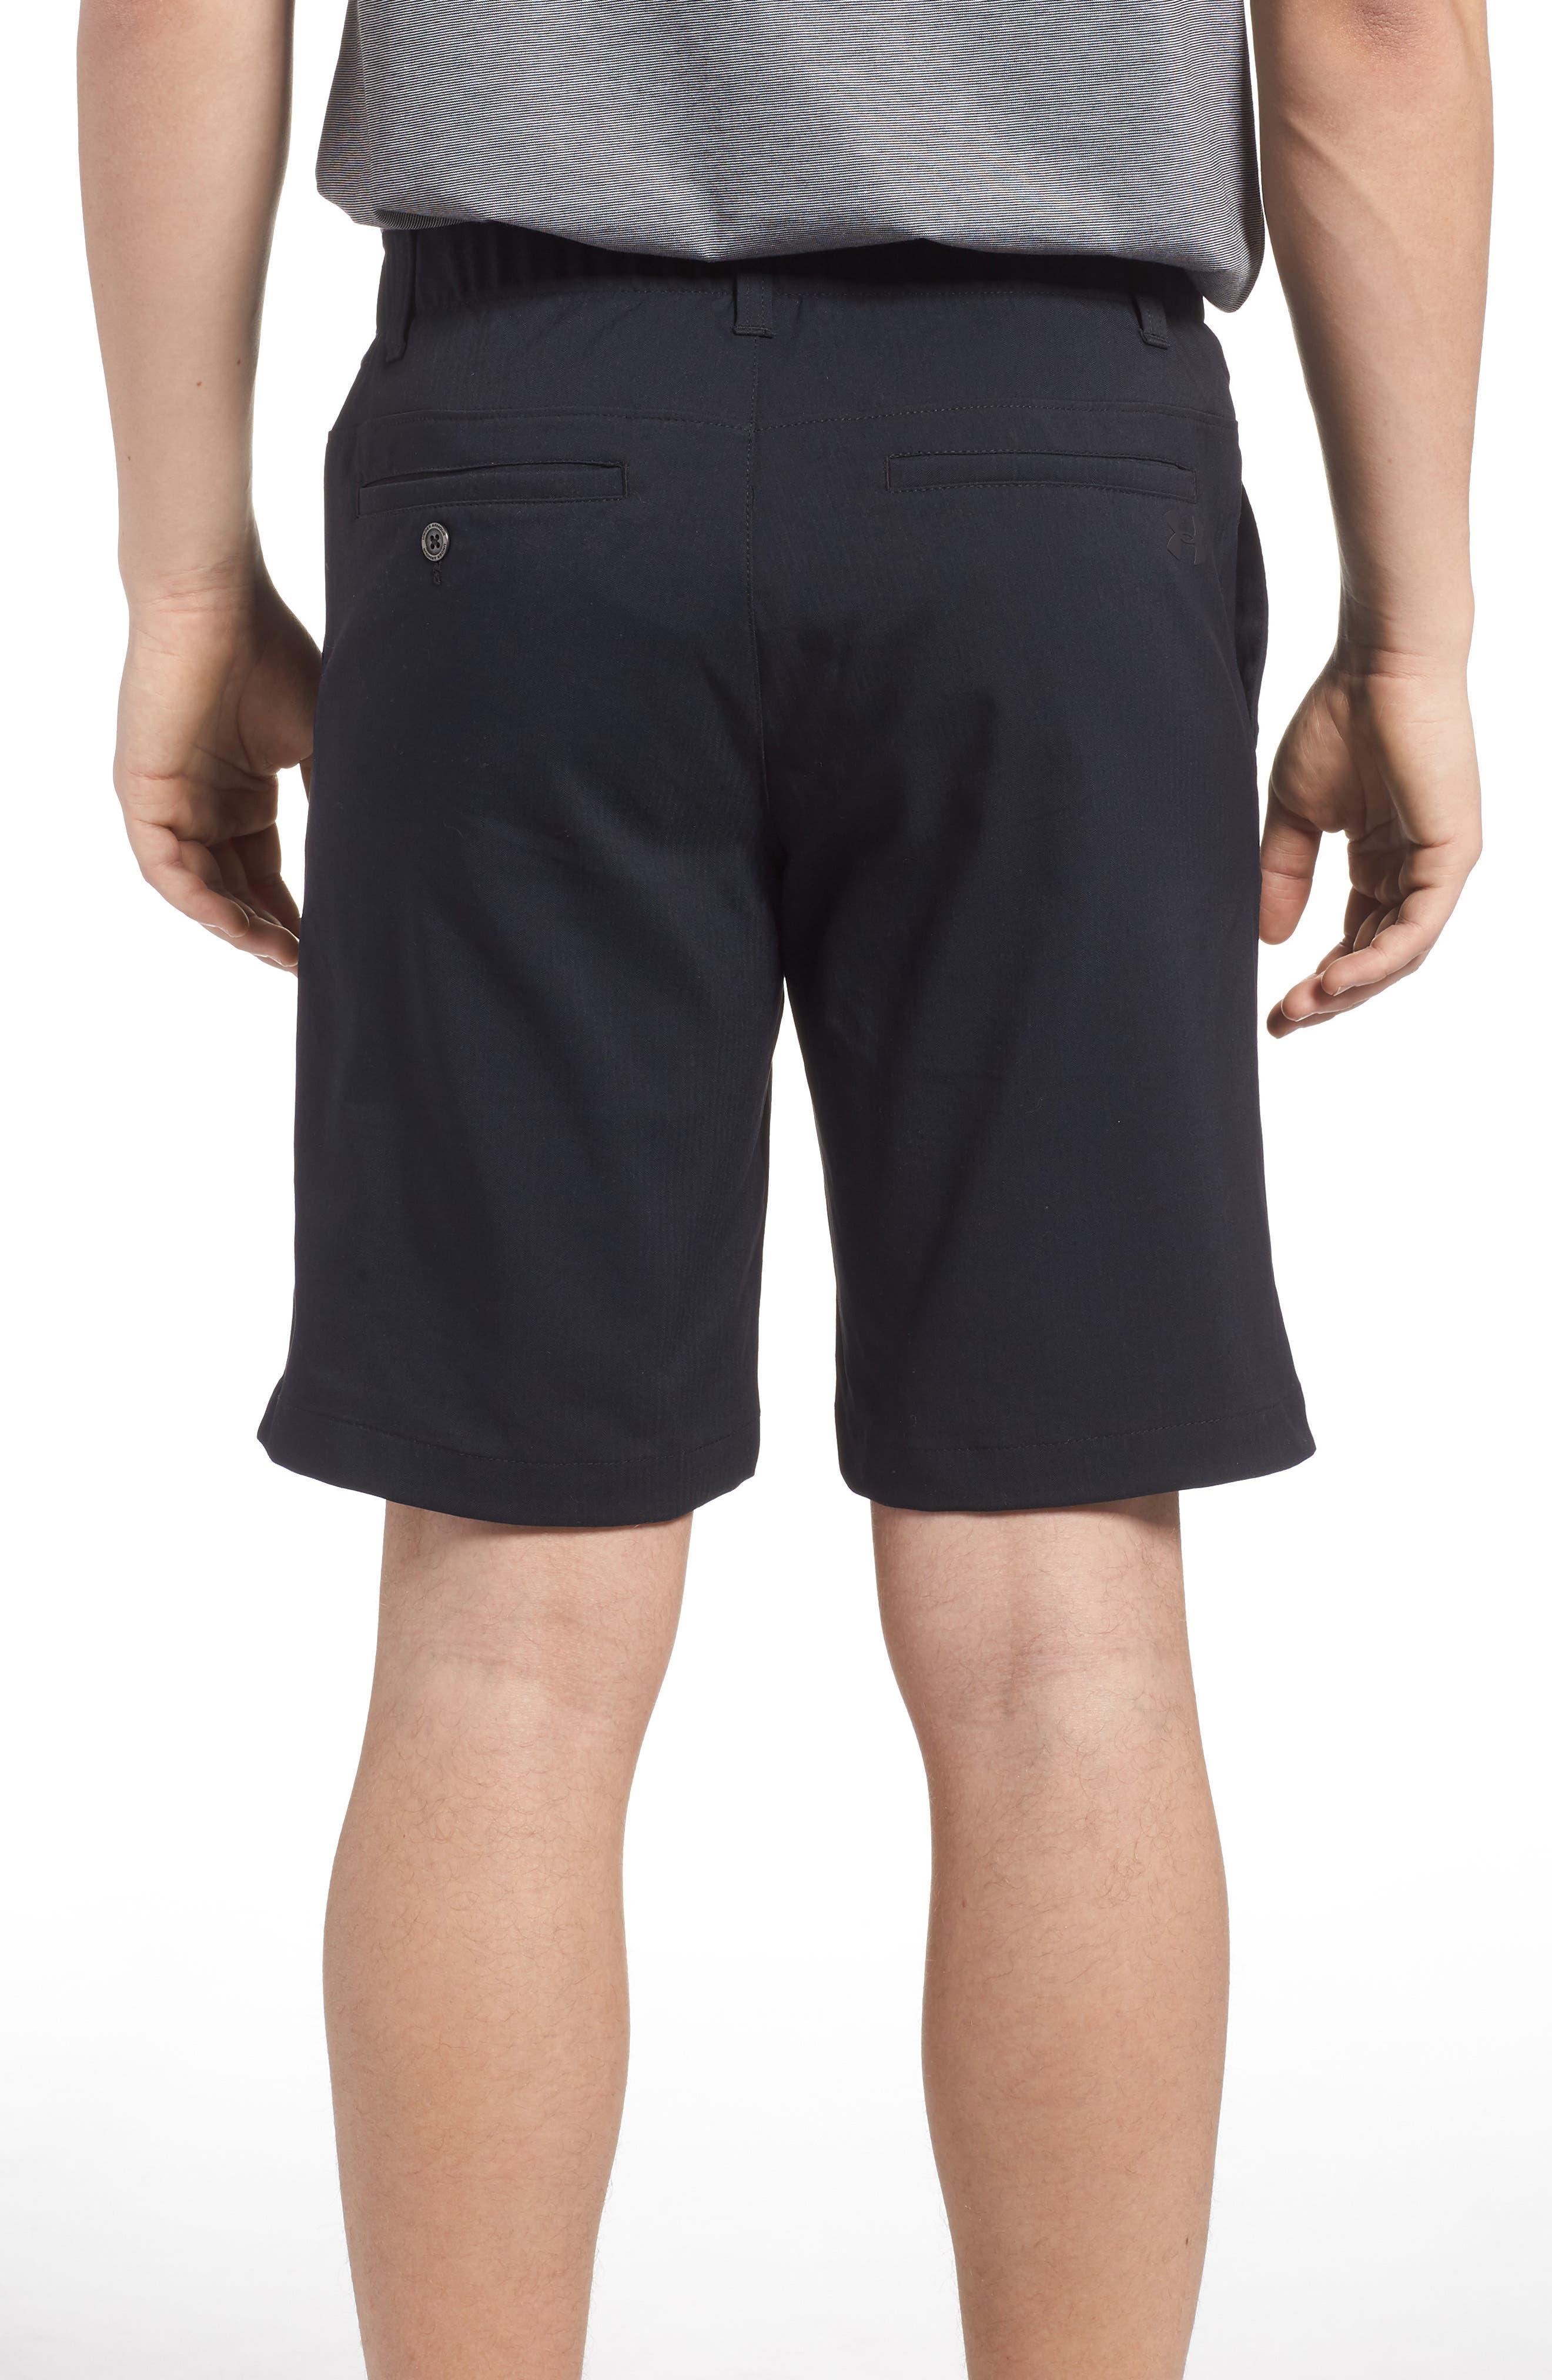 Takeover Regular Fit Golf Shorts,                             Alternate thumbnail 2, color,                             BLACK